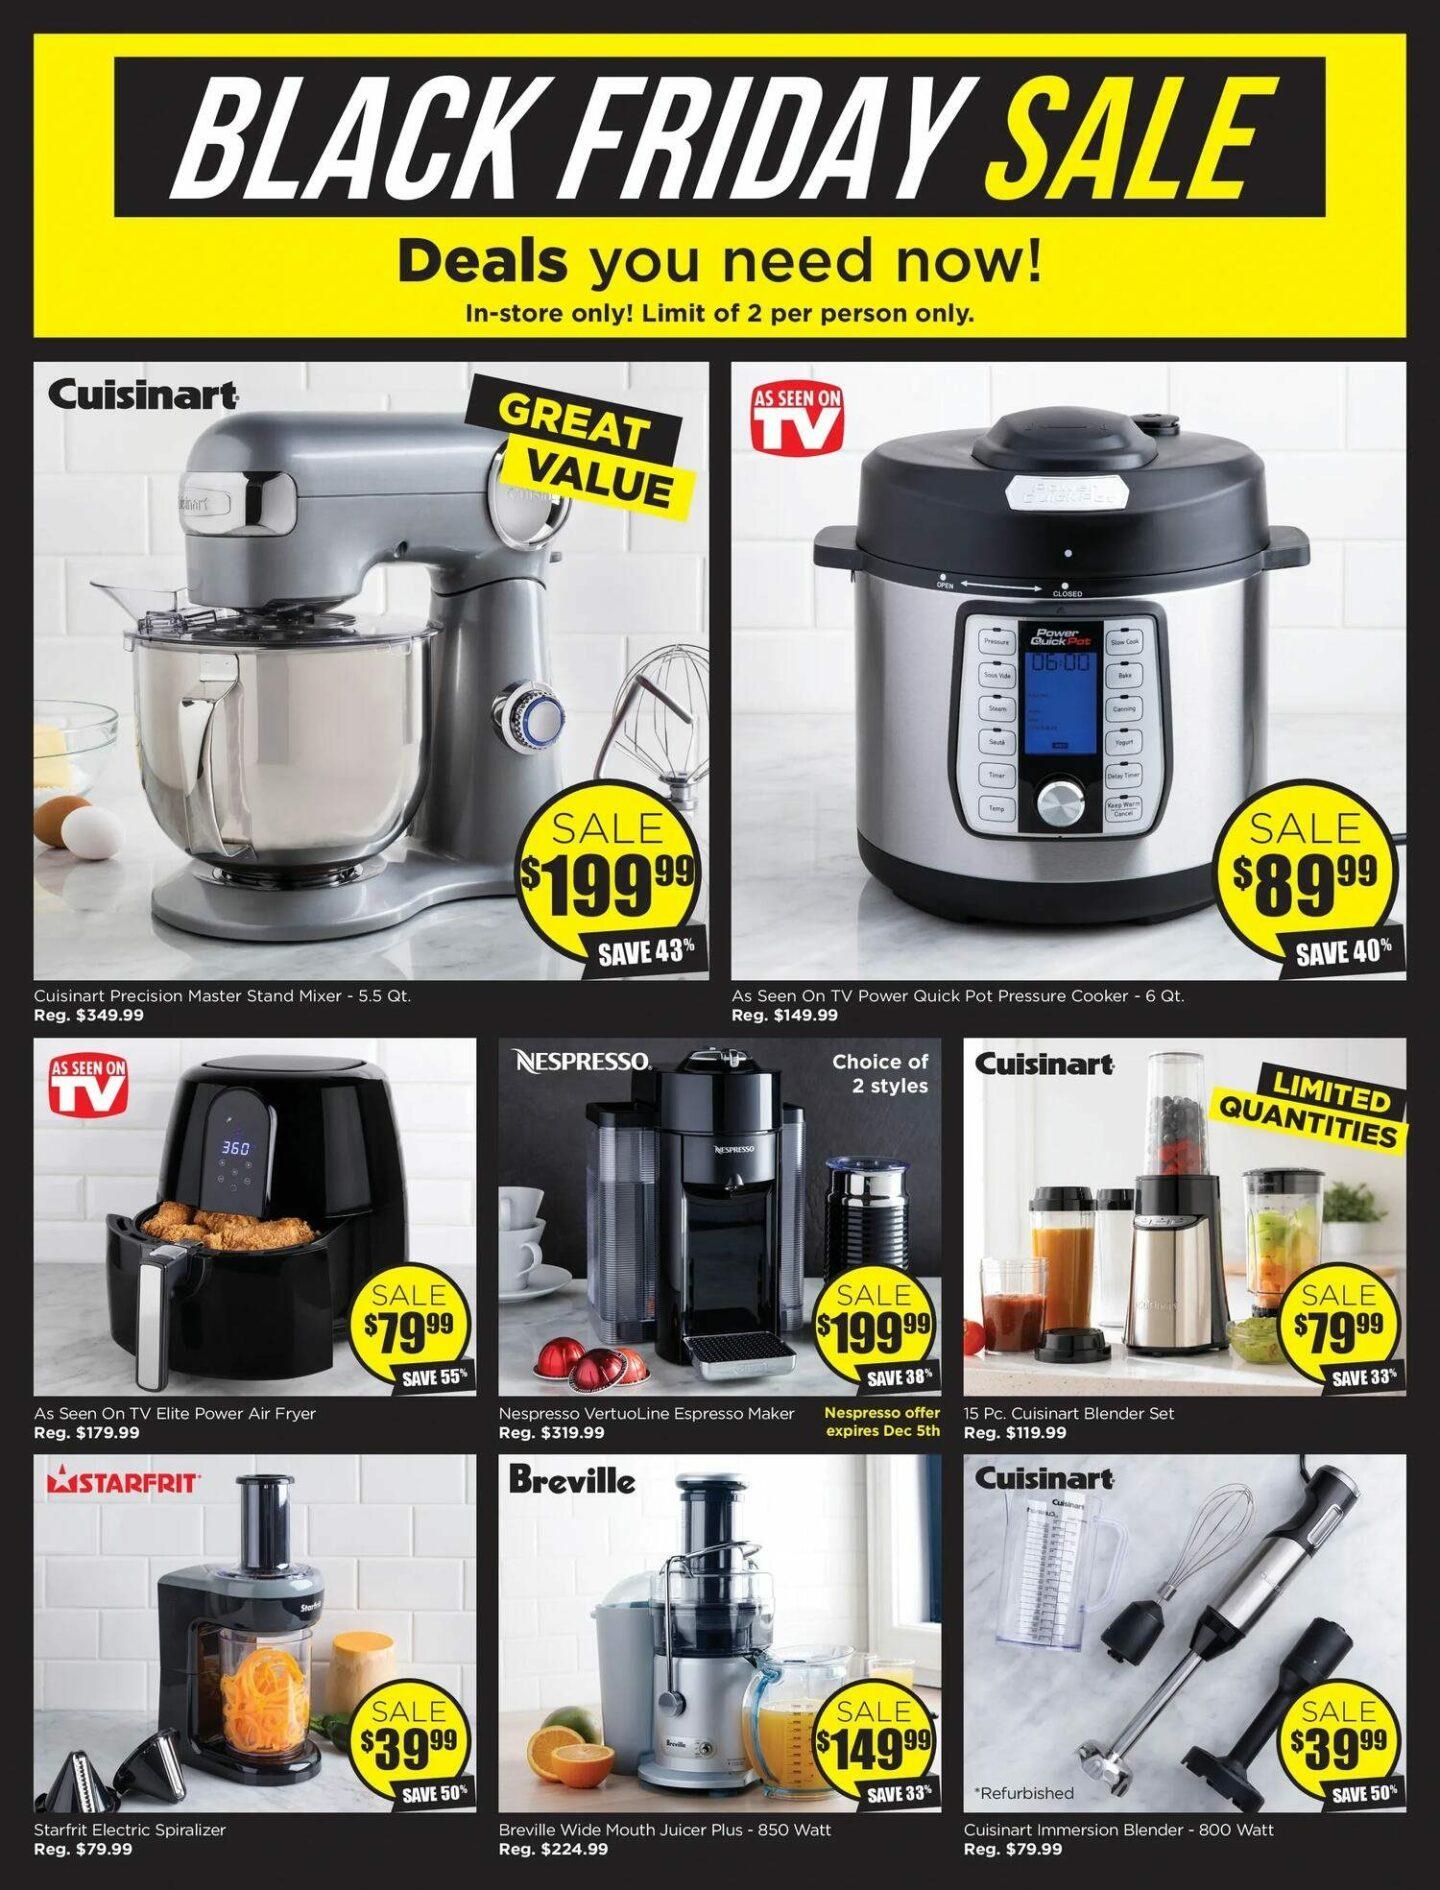 Kitchen Stuff Plus Black Friday 2019 Sale Flyer